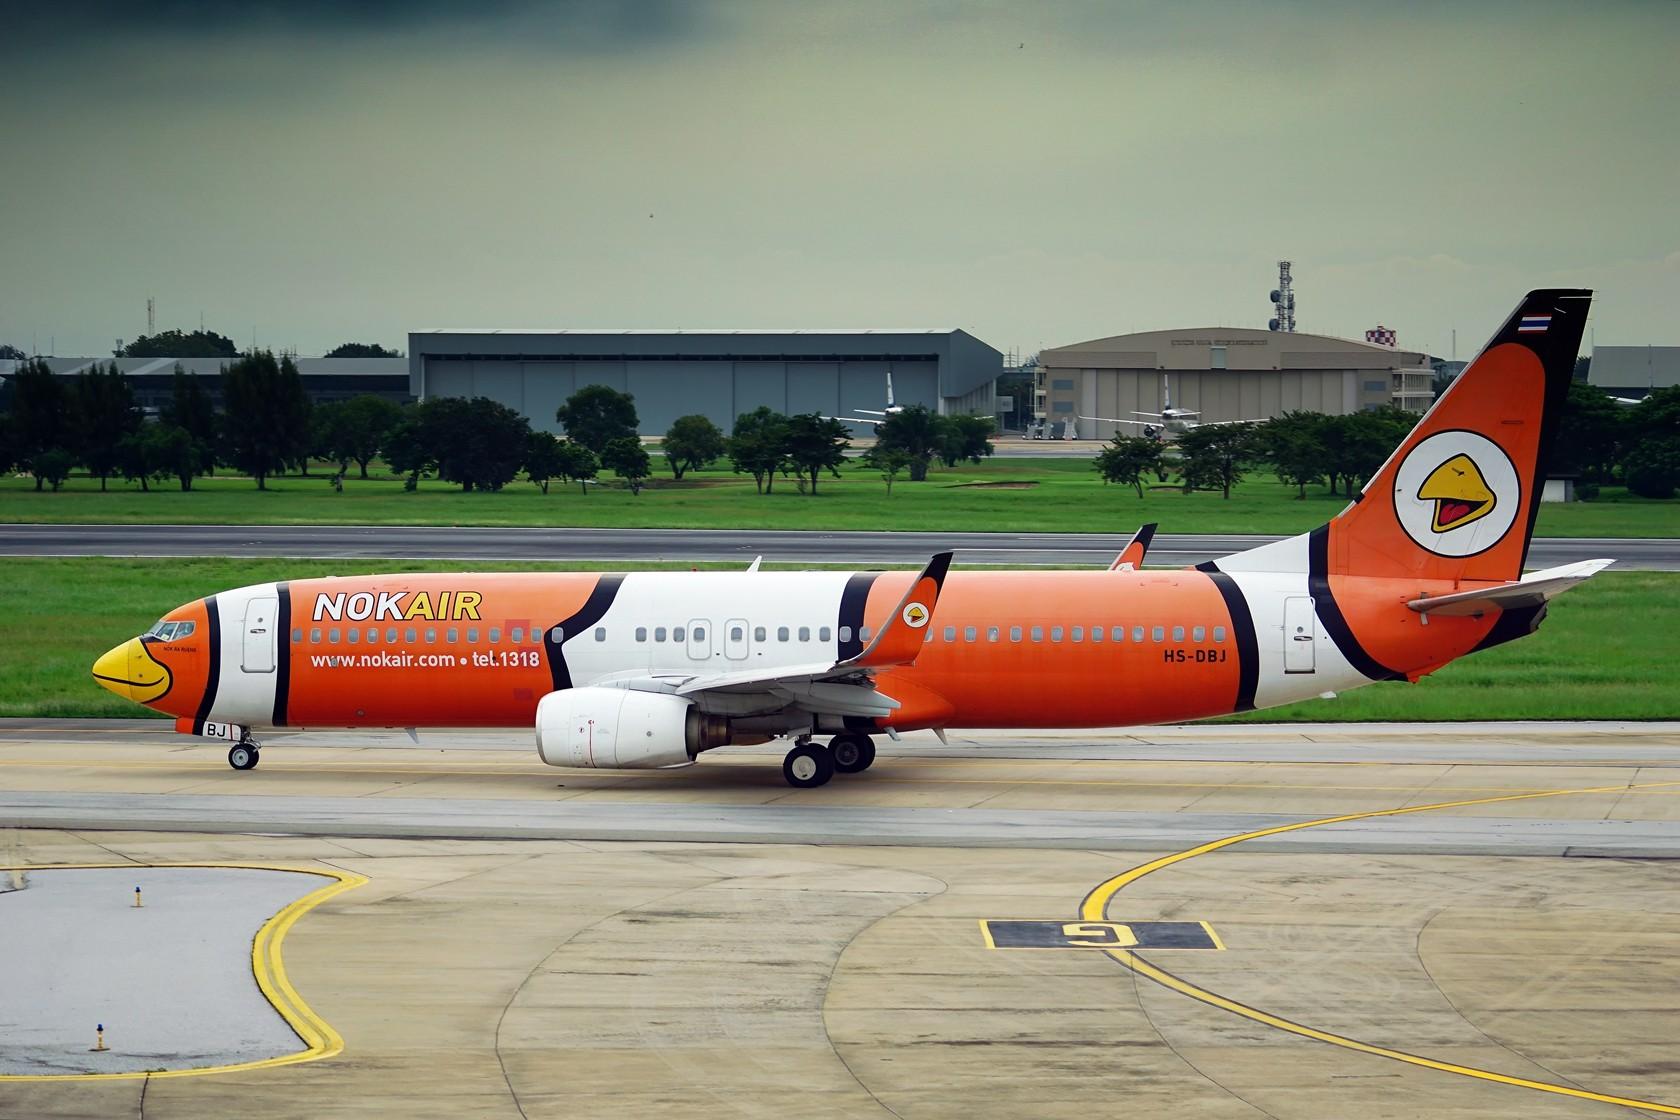 Re:nokaie 皇雀航空 不说别的 就问你萌不萌 BOEING 737-800 HS-DBJ 泰国曼谷廊曼国际机场